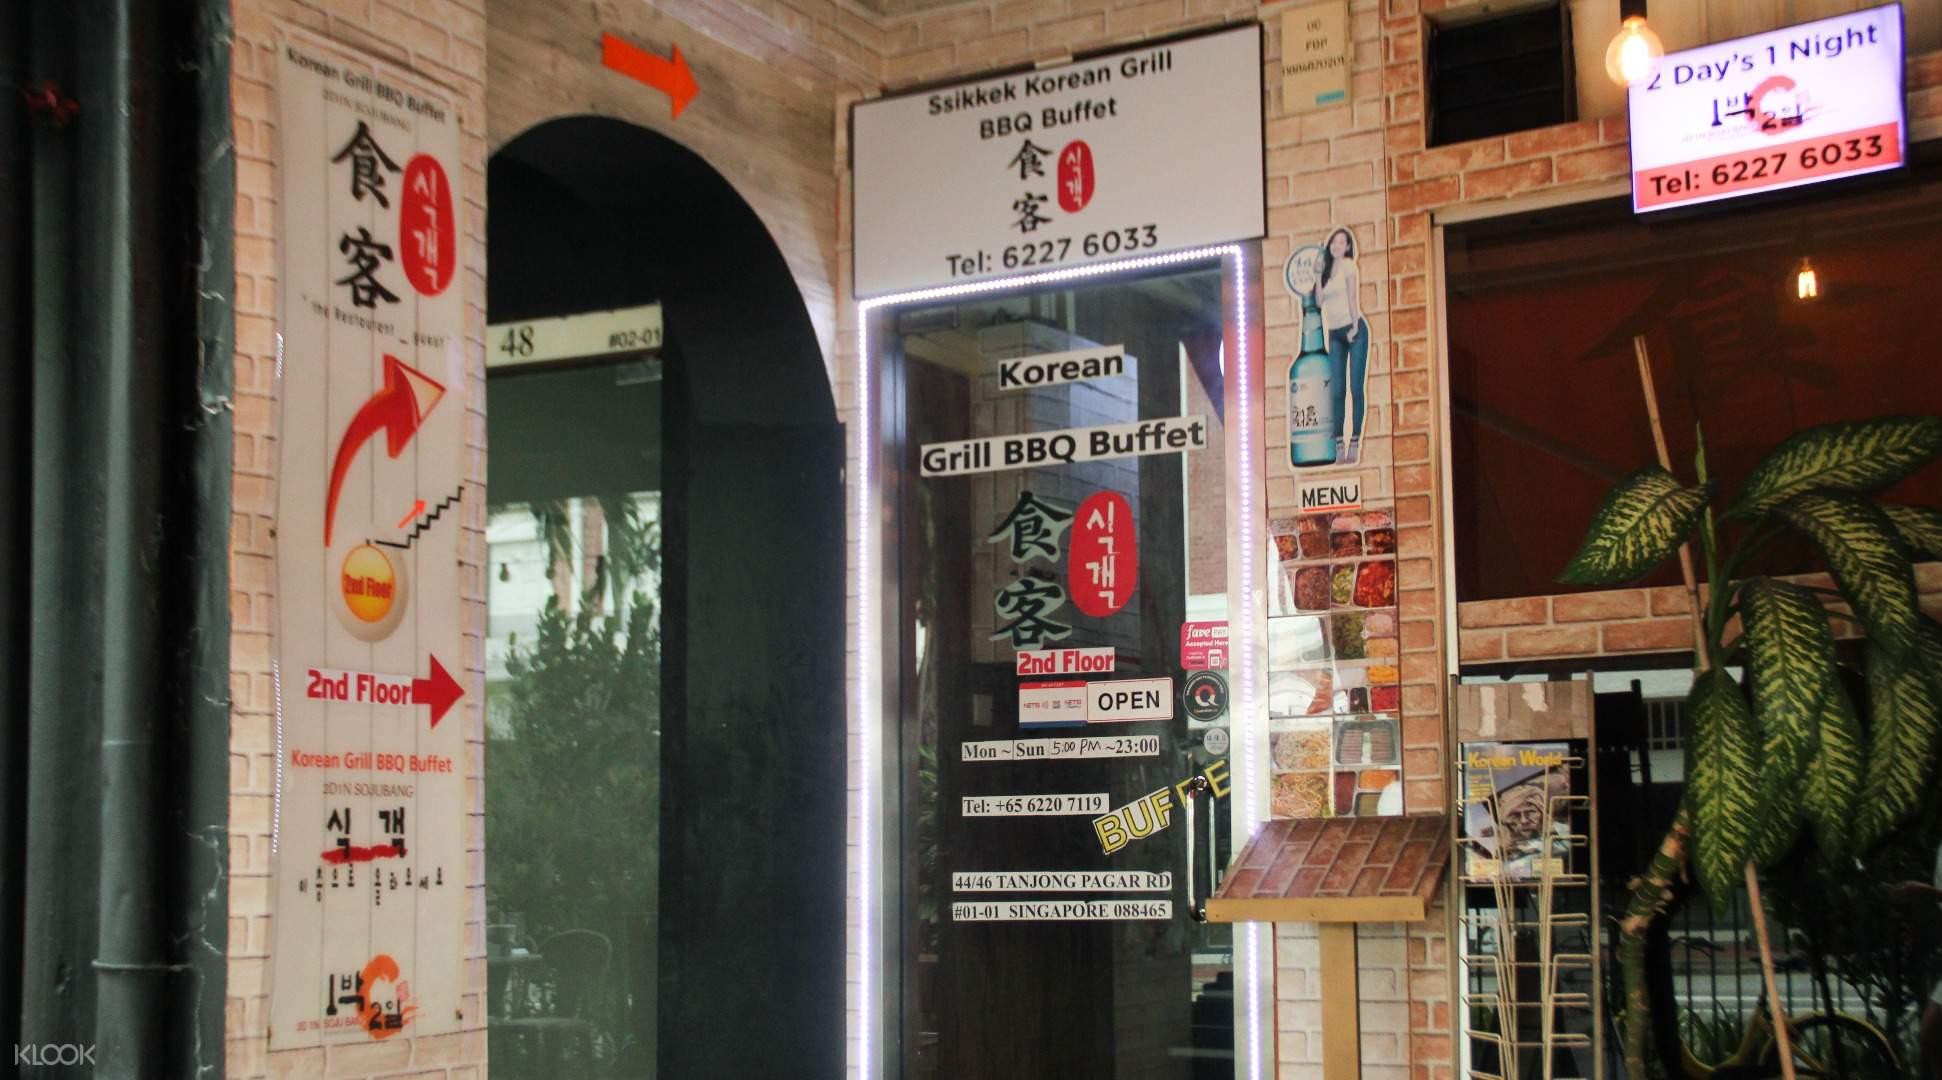 Awe Inspiring Ssikkek Korean Grill Bbq Buffet In Tanjong Pagar Interior Design Ideas Gentotryabchikinfo